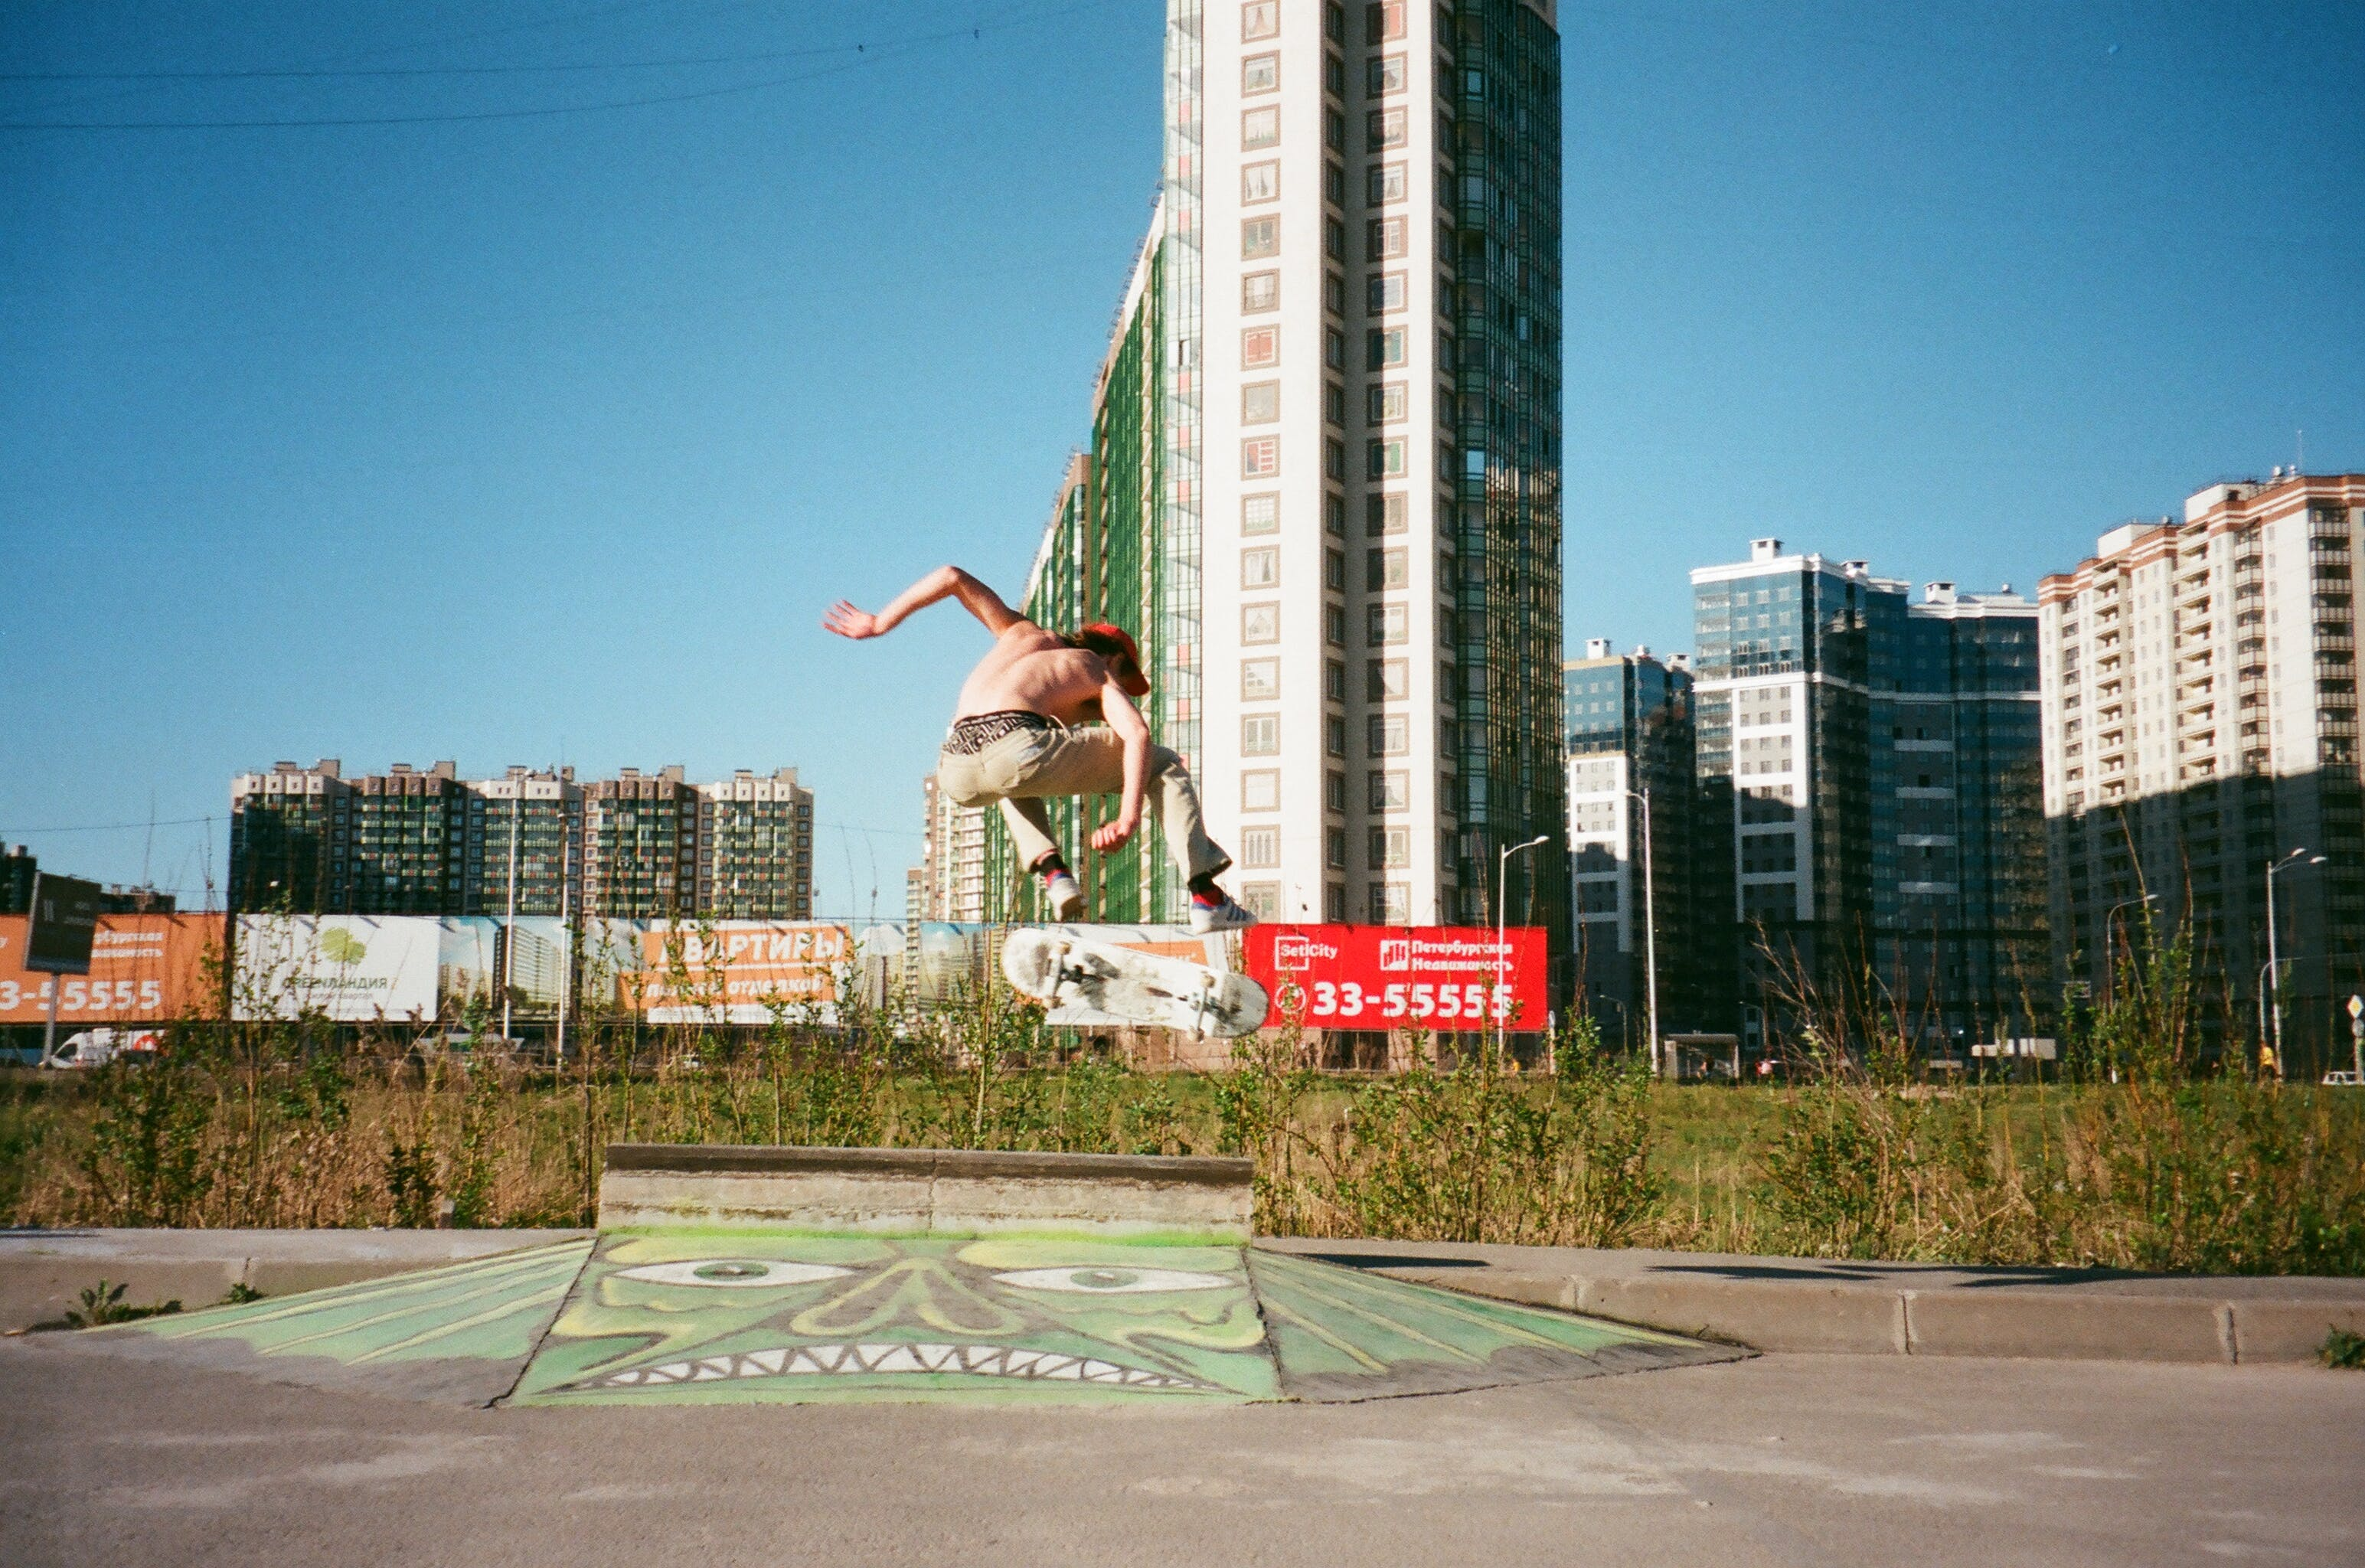 Person Skateboarding on Ramp